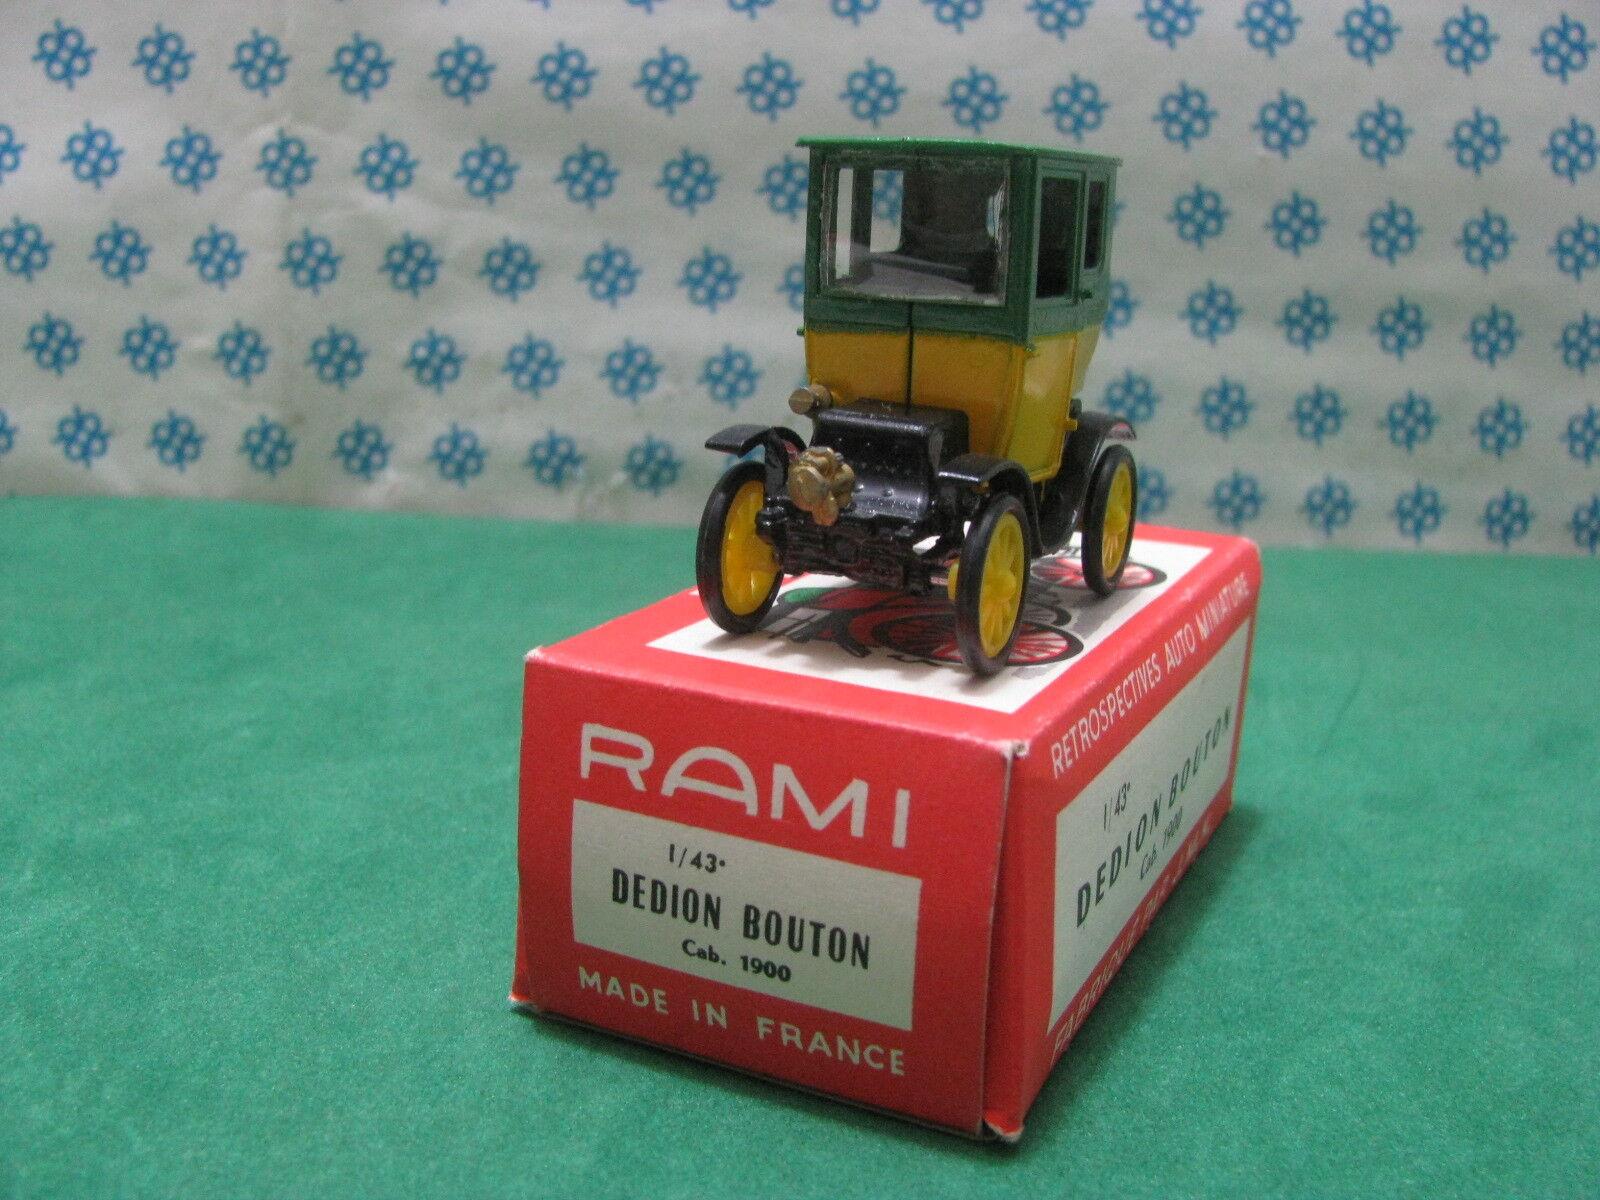 Vintage Rami   -  DEDION BOUTON cab. 1900   - 1 43  France